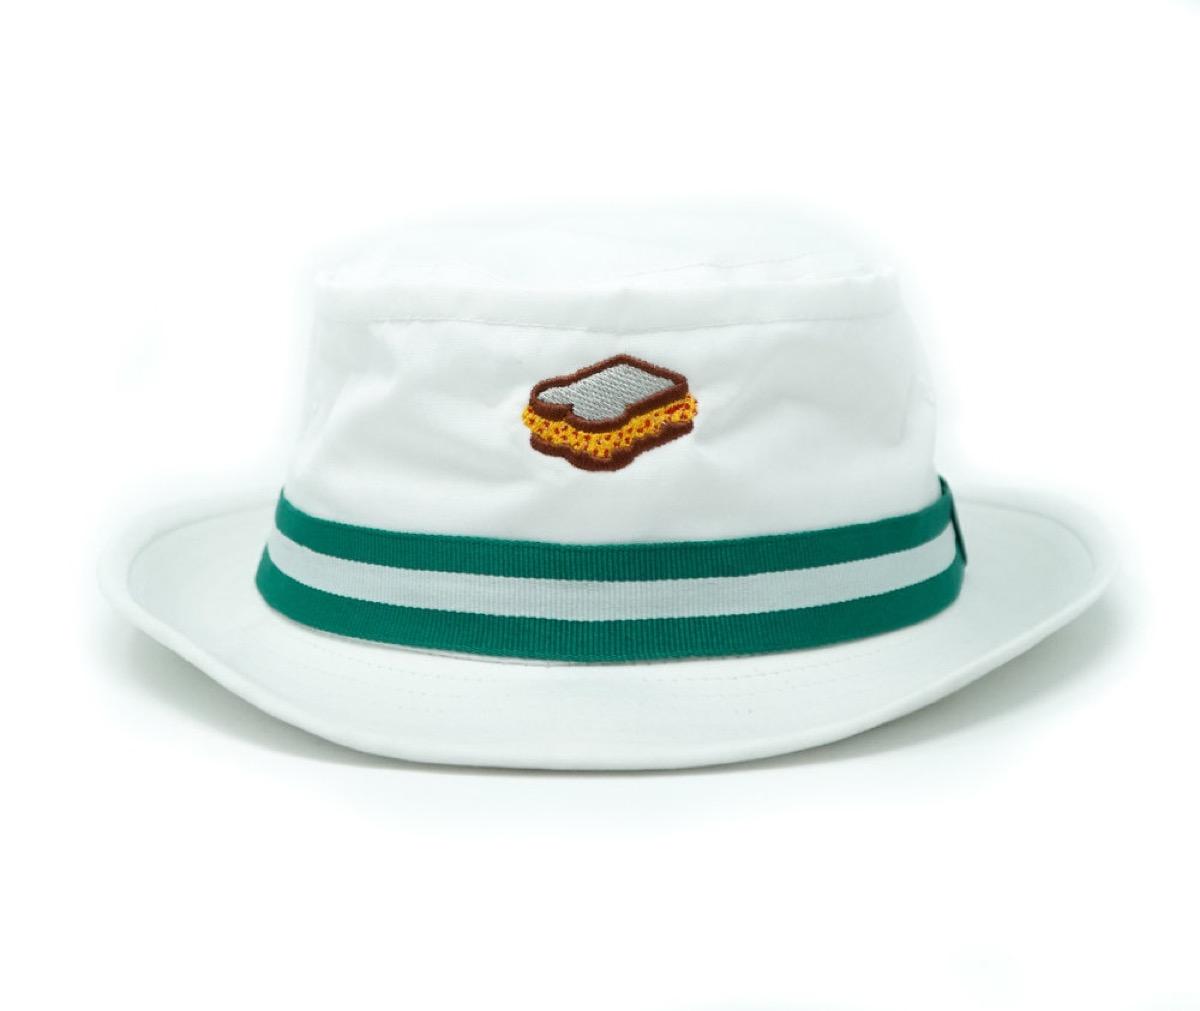 golf hat - Pimento Bucket